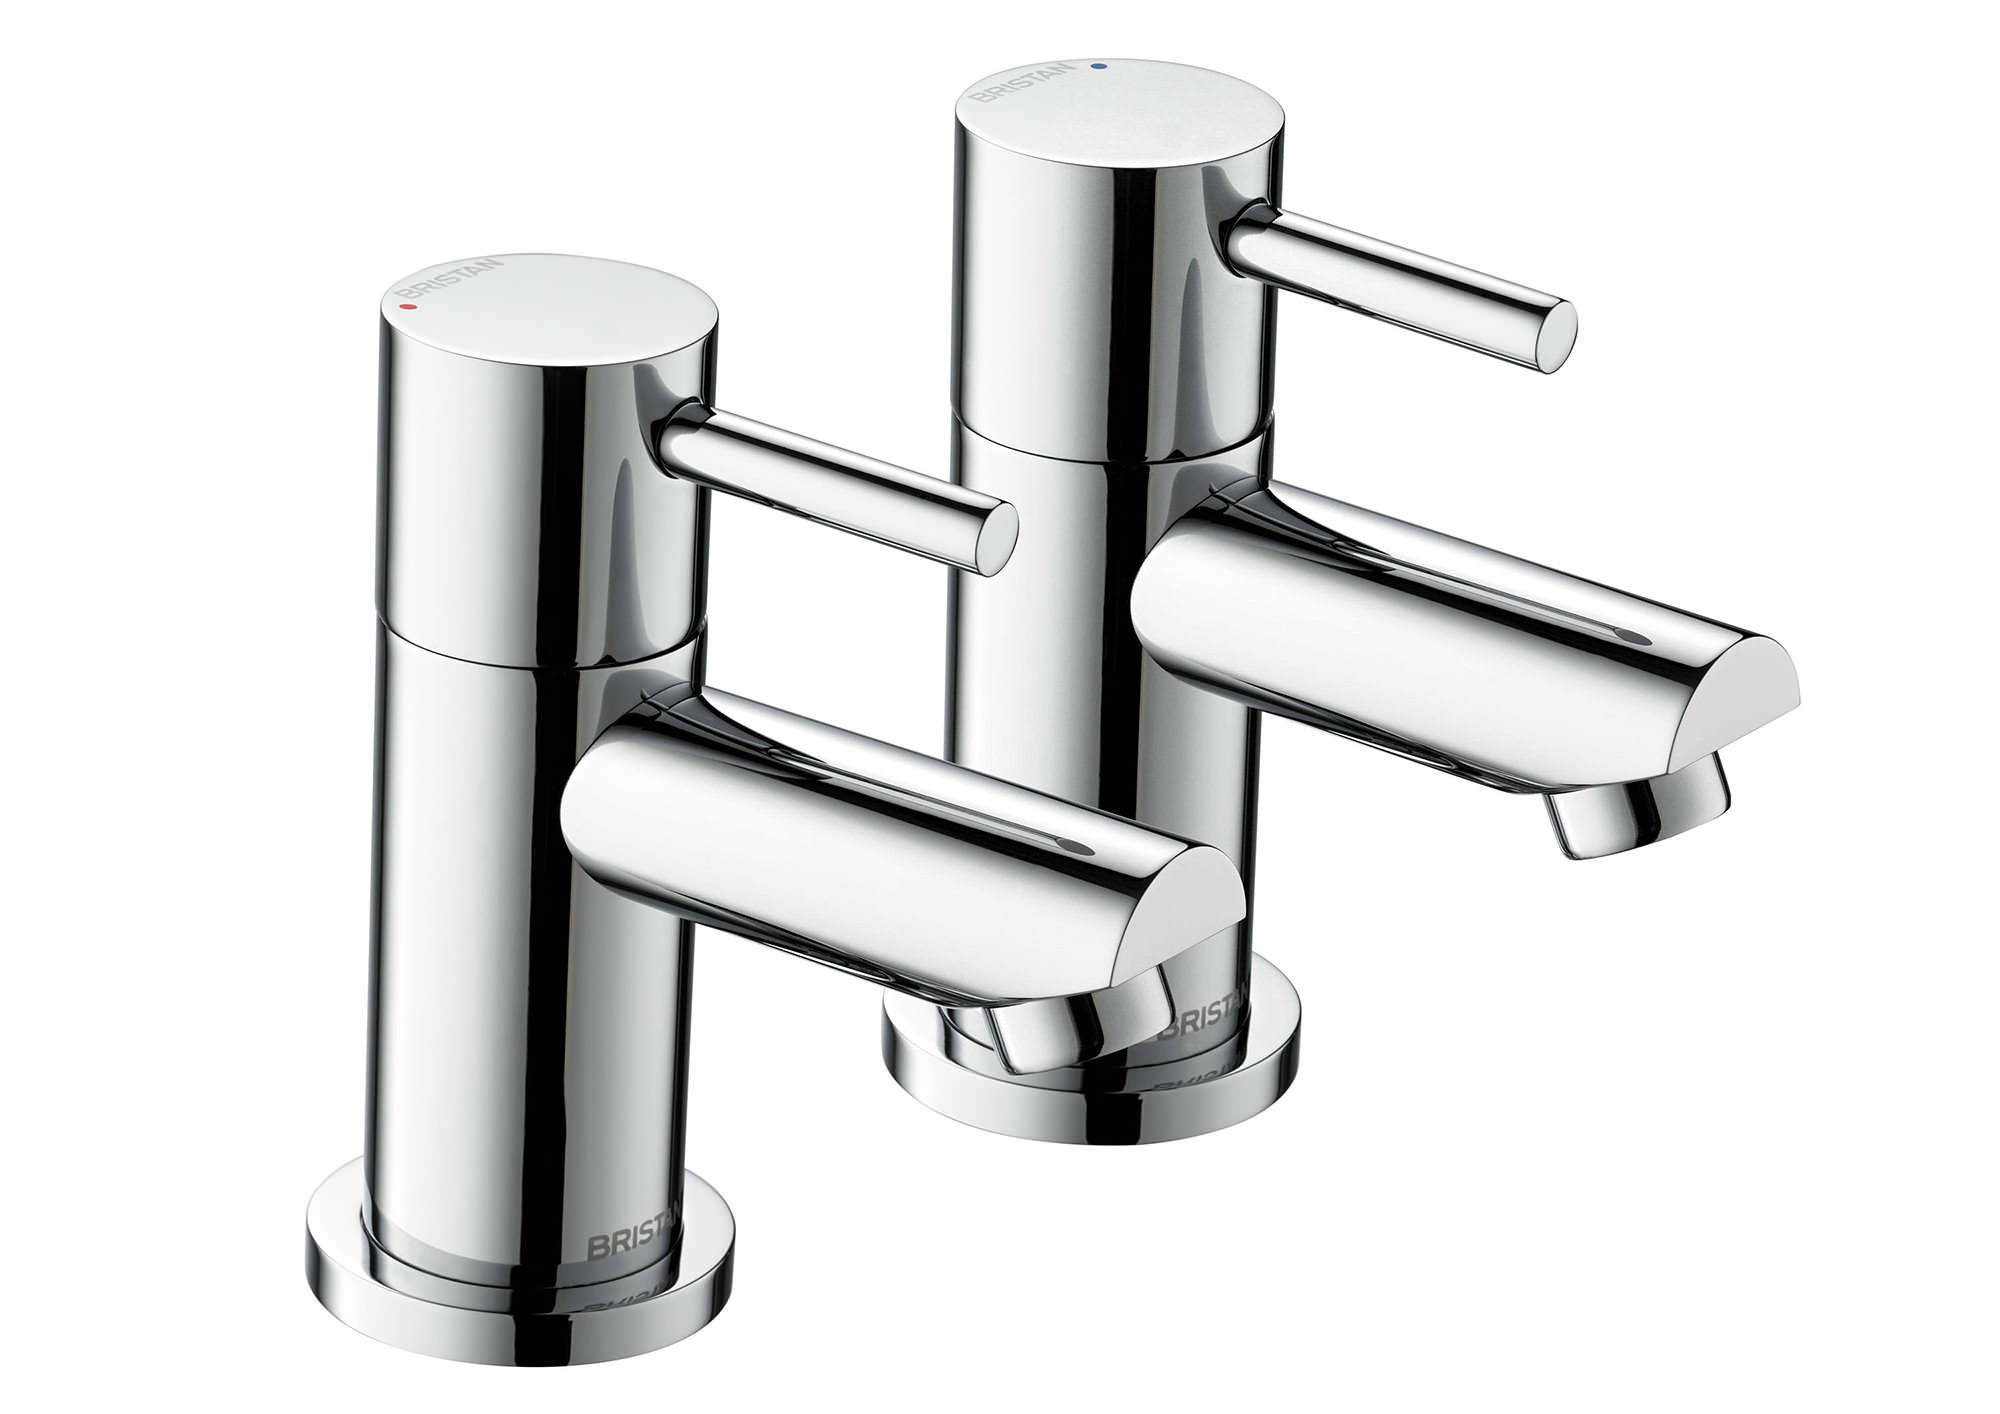 Chrome Bristan Kitchen Taps: Bristan Blitz Chrome Plated Bath Taps